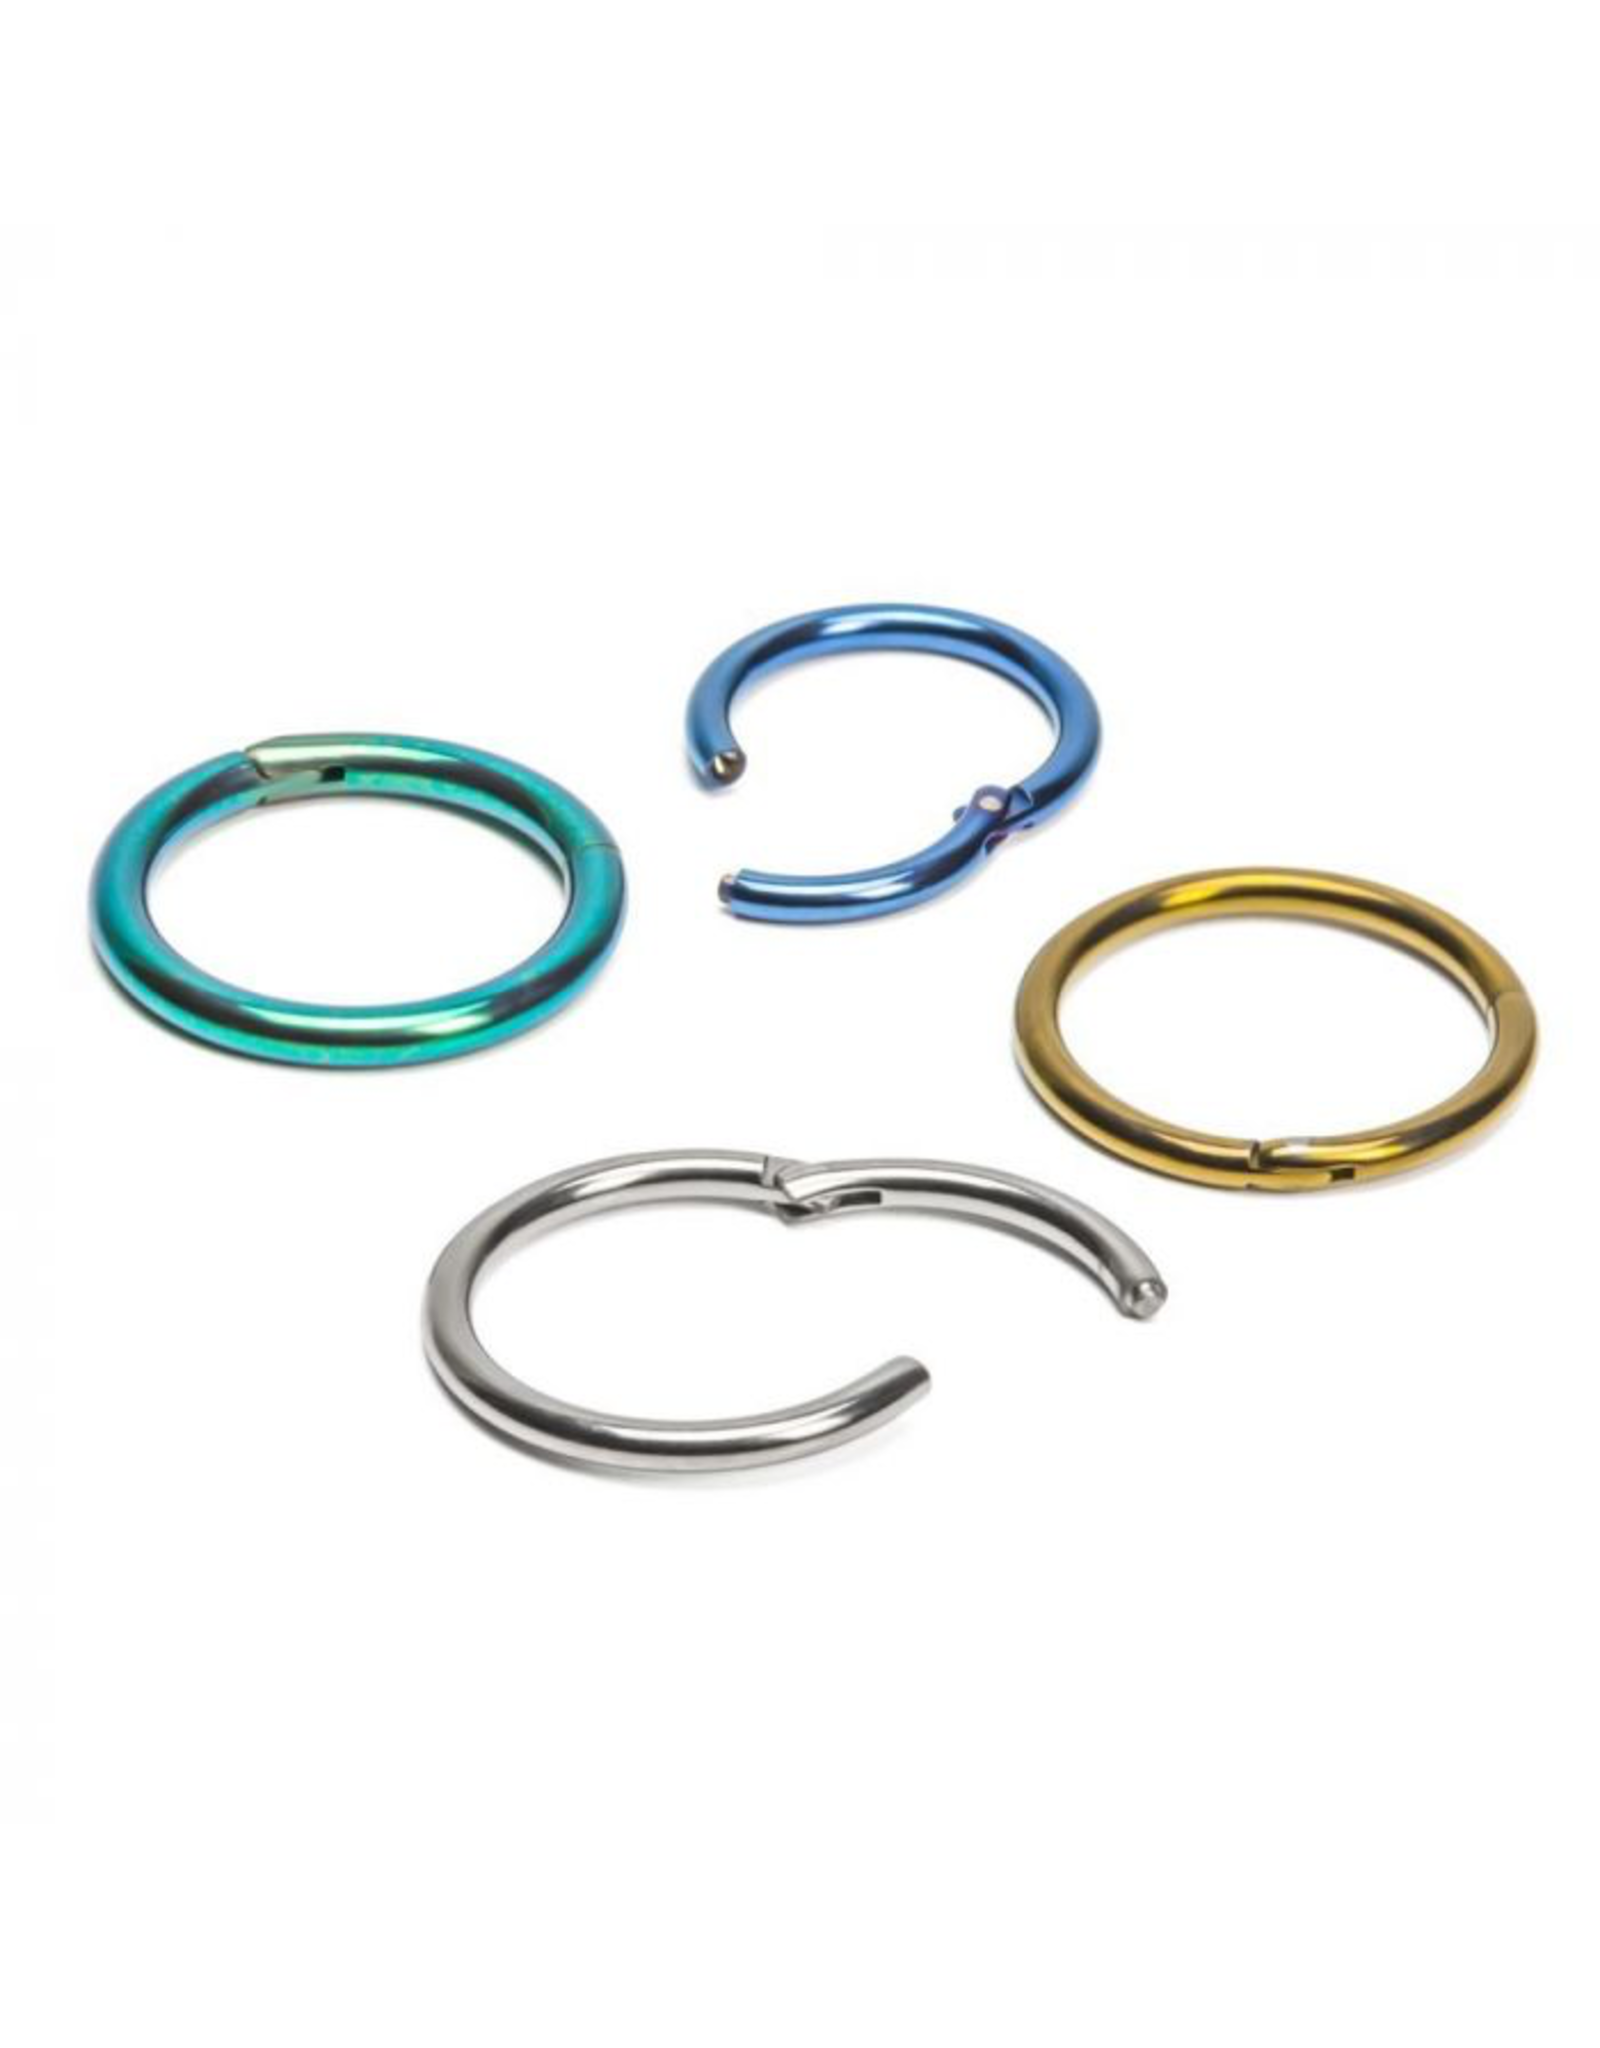 16g Titanium Hinged Rings